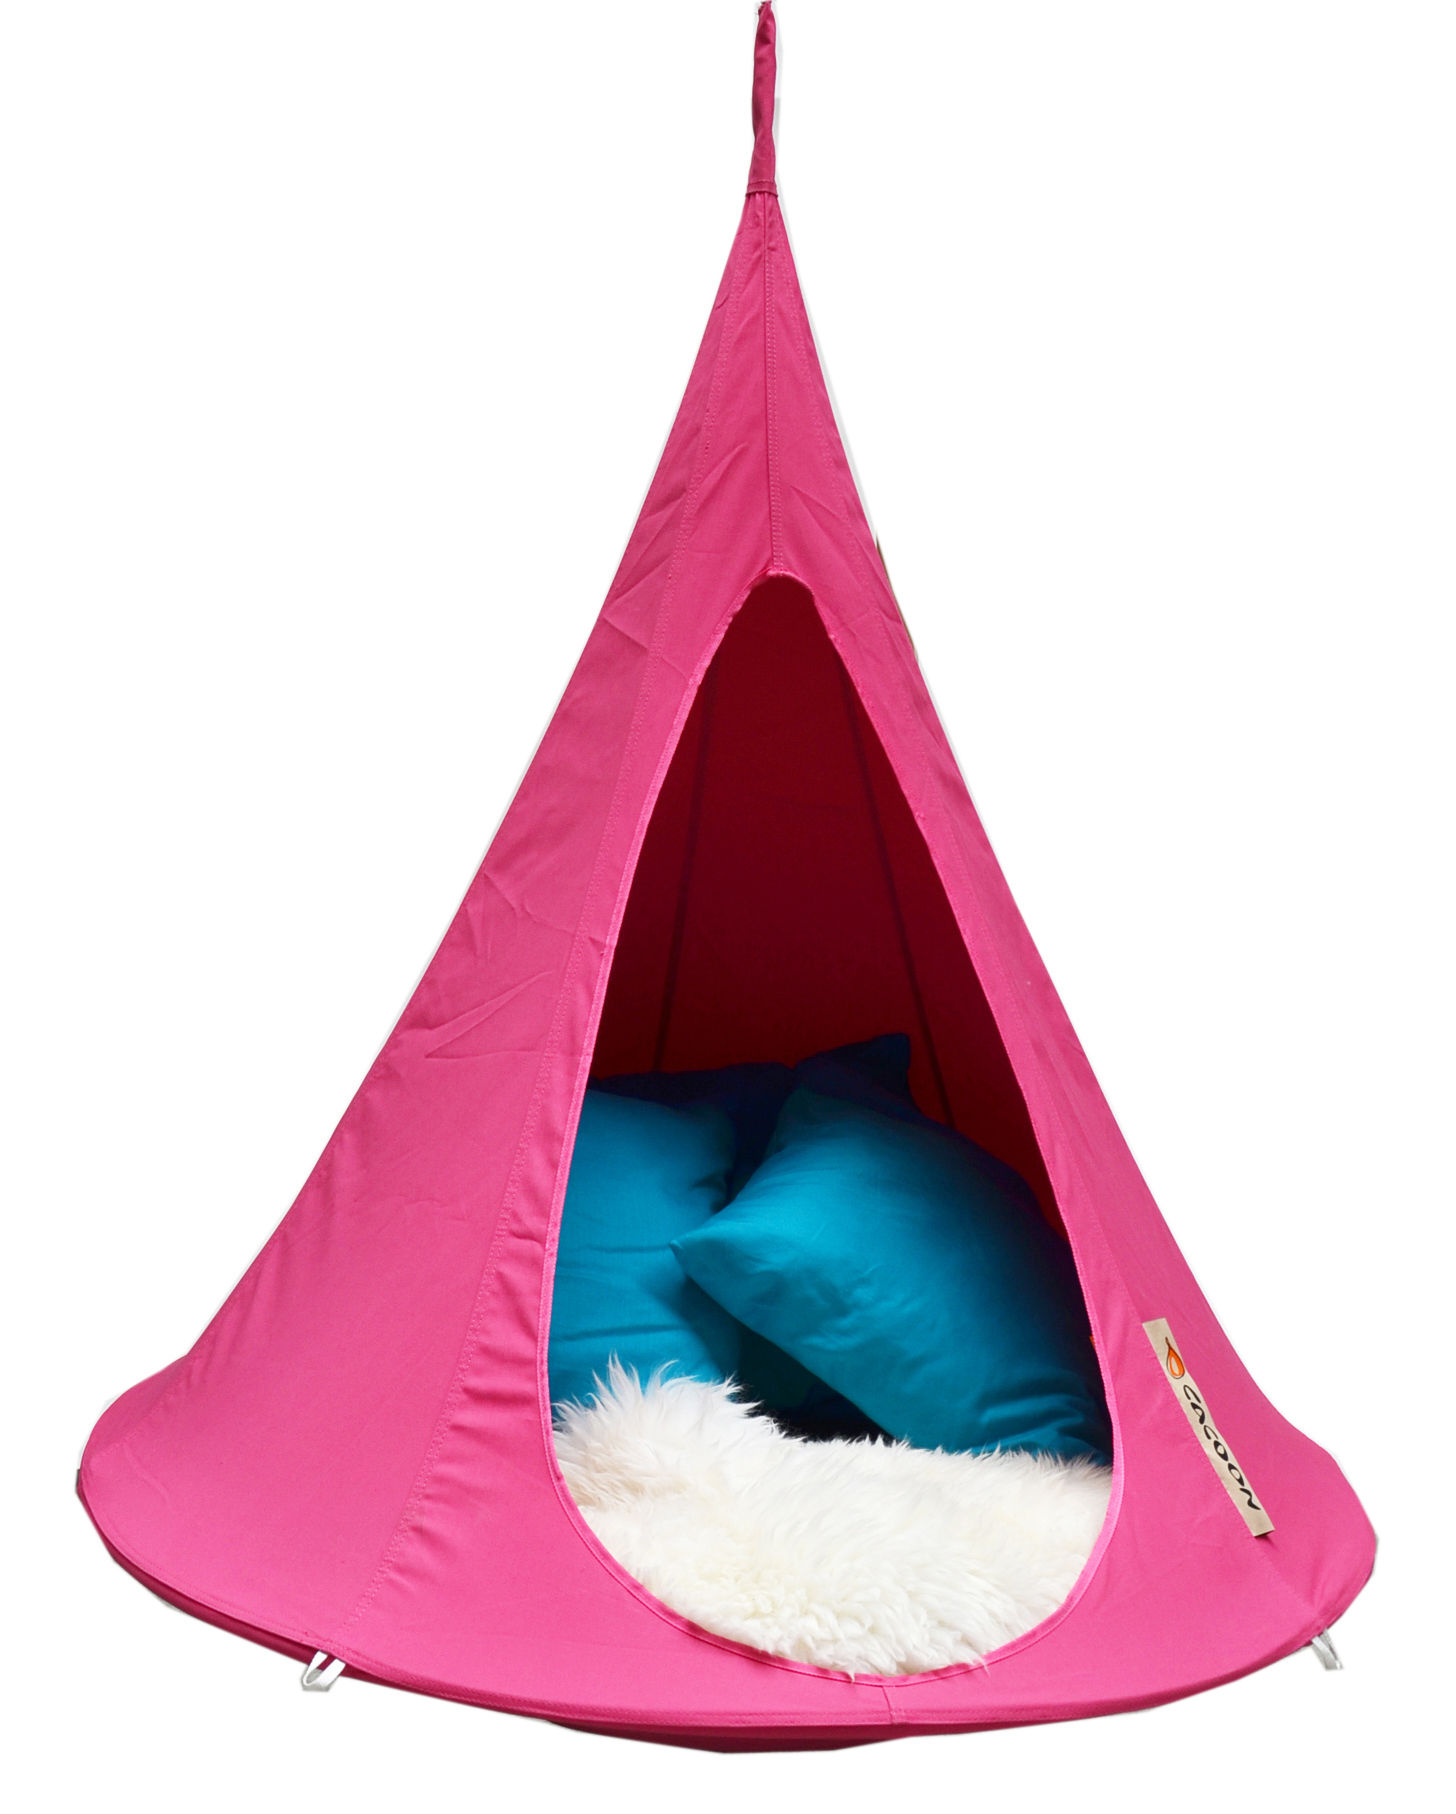 Möbel - Möbel für Kinder - Bebo Hängesessel / Ø 120 cm - Kindergröße - Cacoon - Pink - Leinen